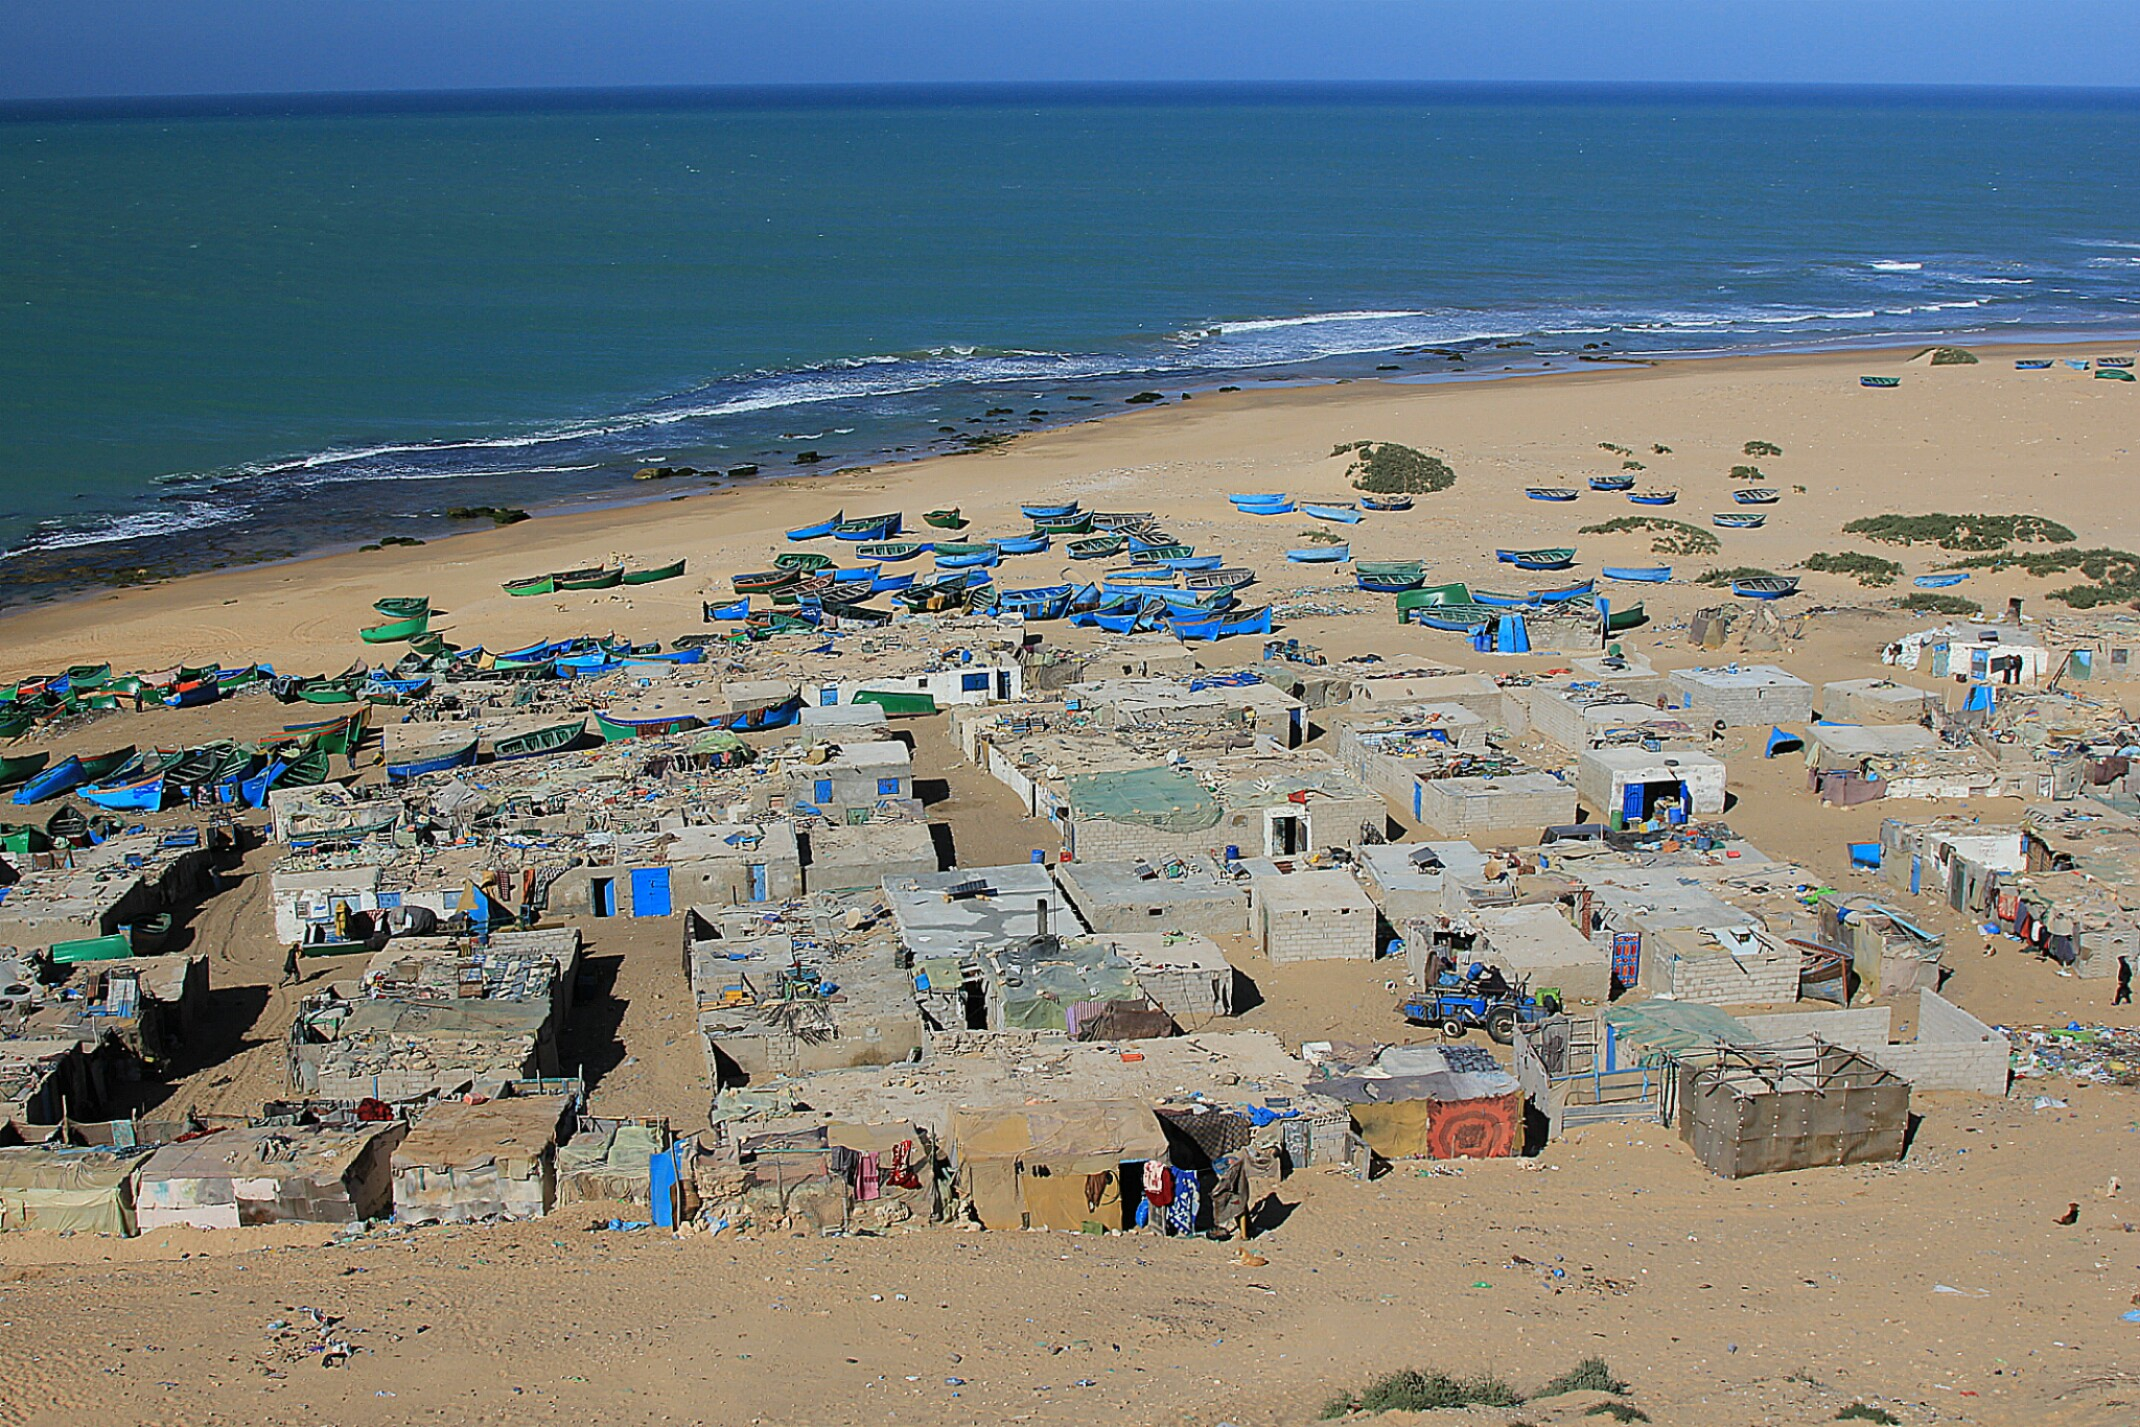 Maroko.Wioska rybacka nad Oceanem Atlantyckim